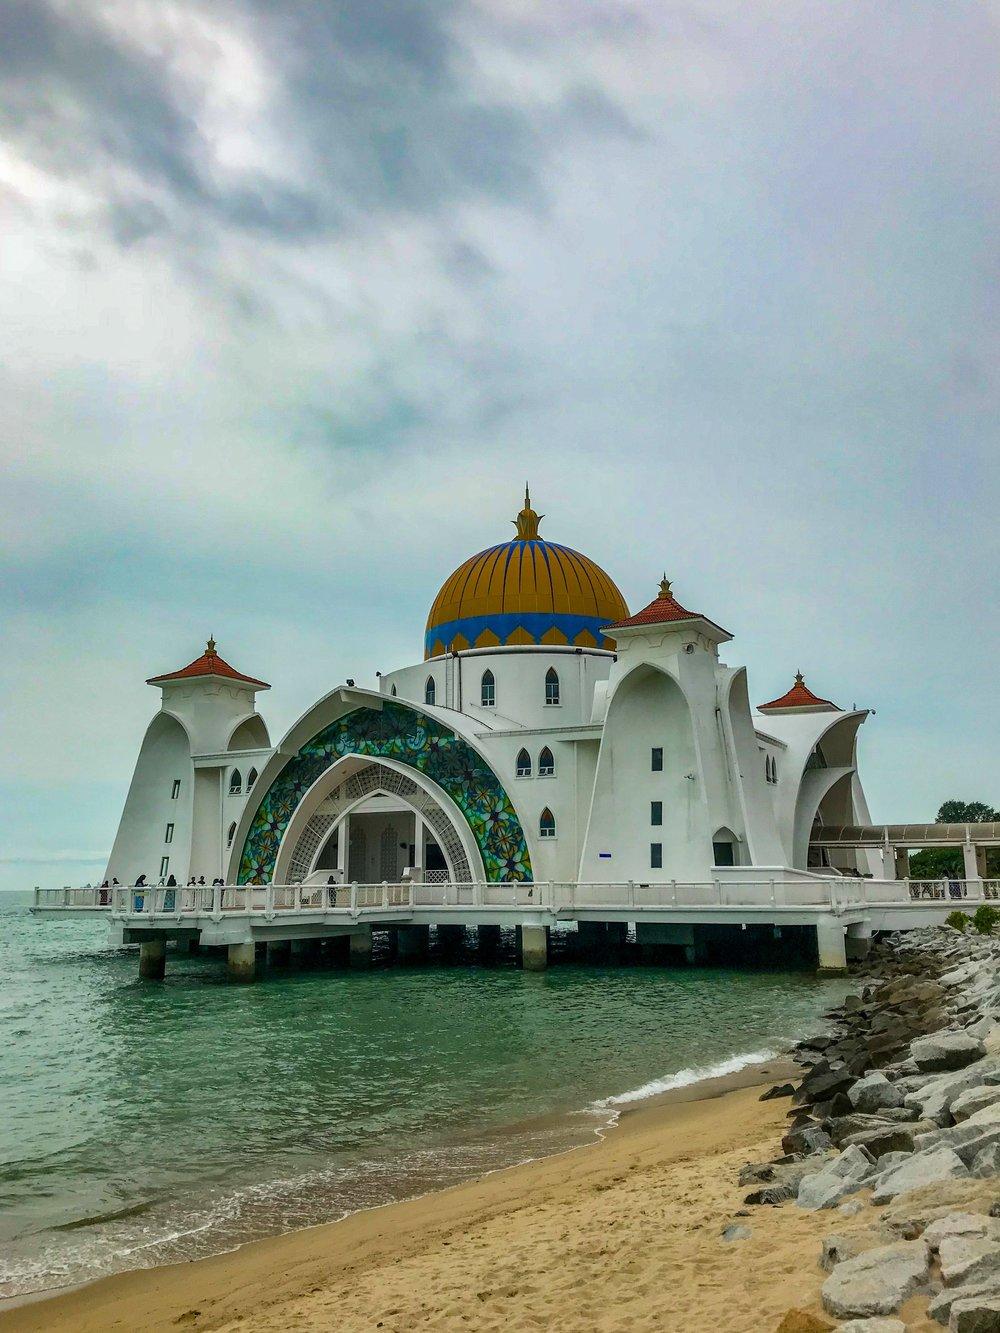 Melaka's floating mosque